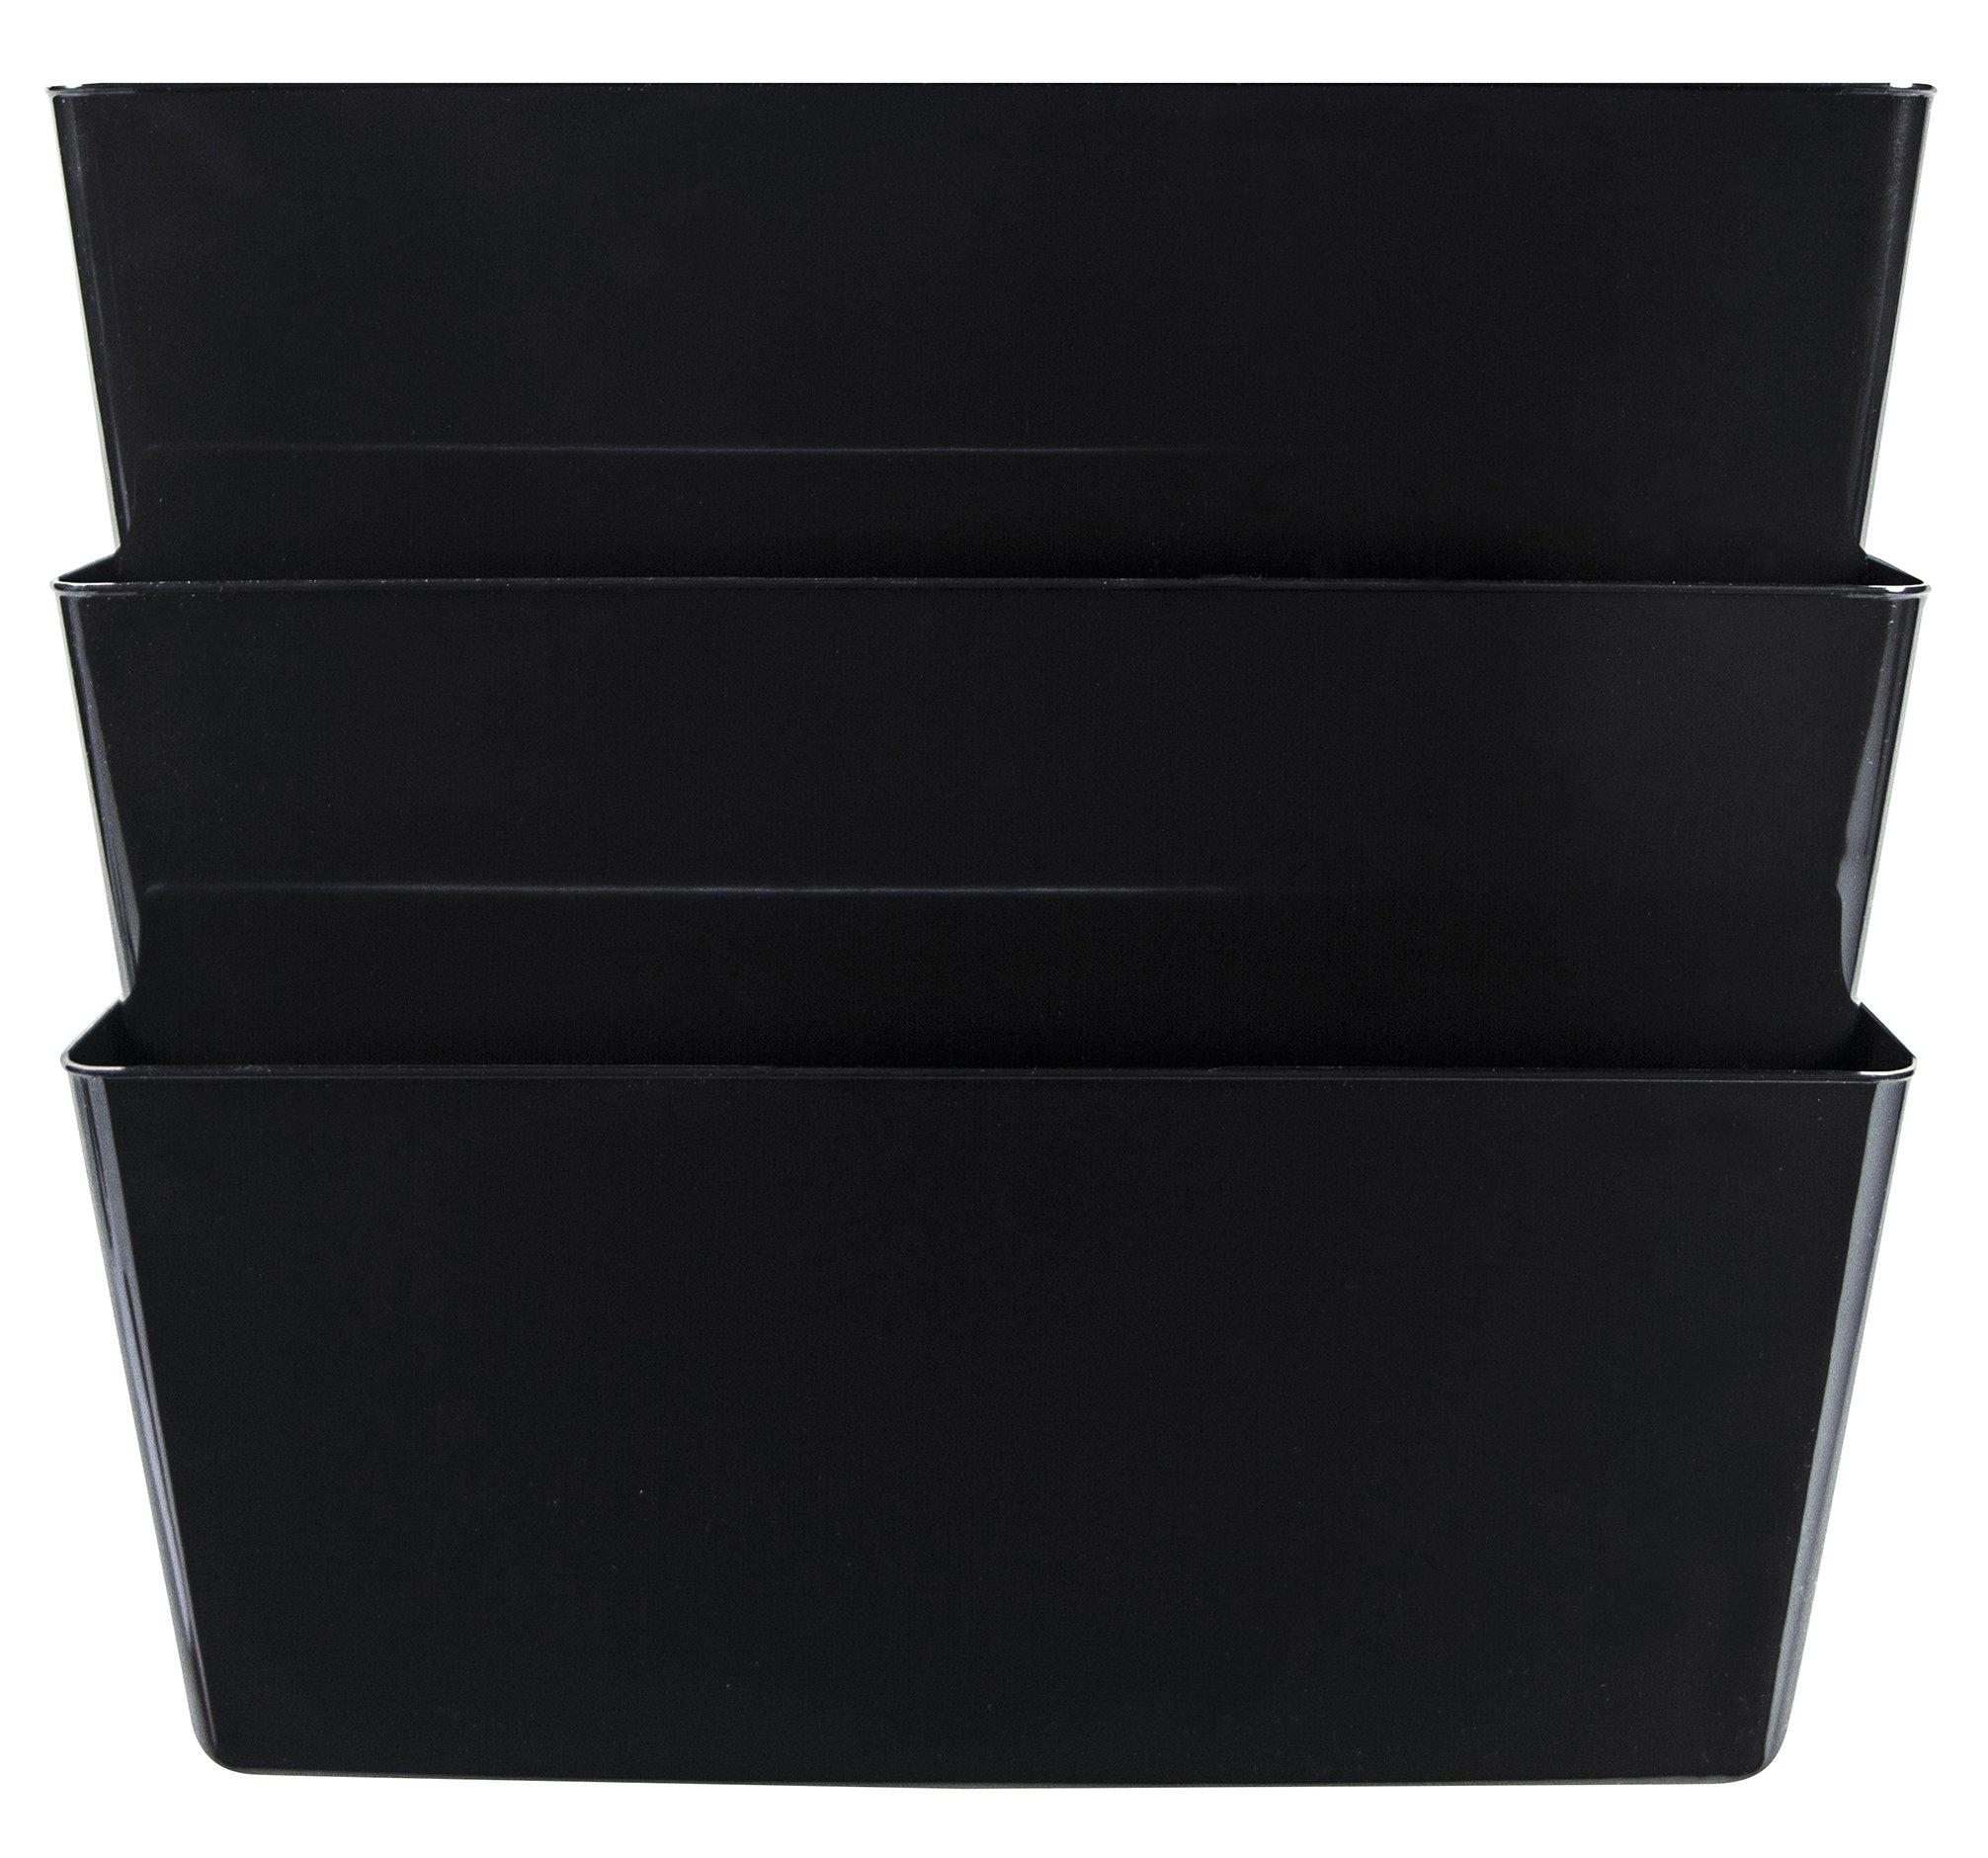 Storex Unbreakable Letter Sized Wall Files, 3-Pack, Black, Case of 6 (STX70353U06C)